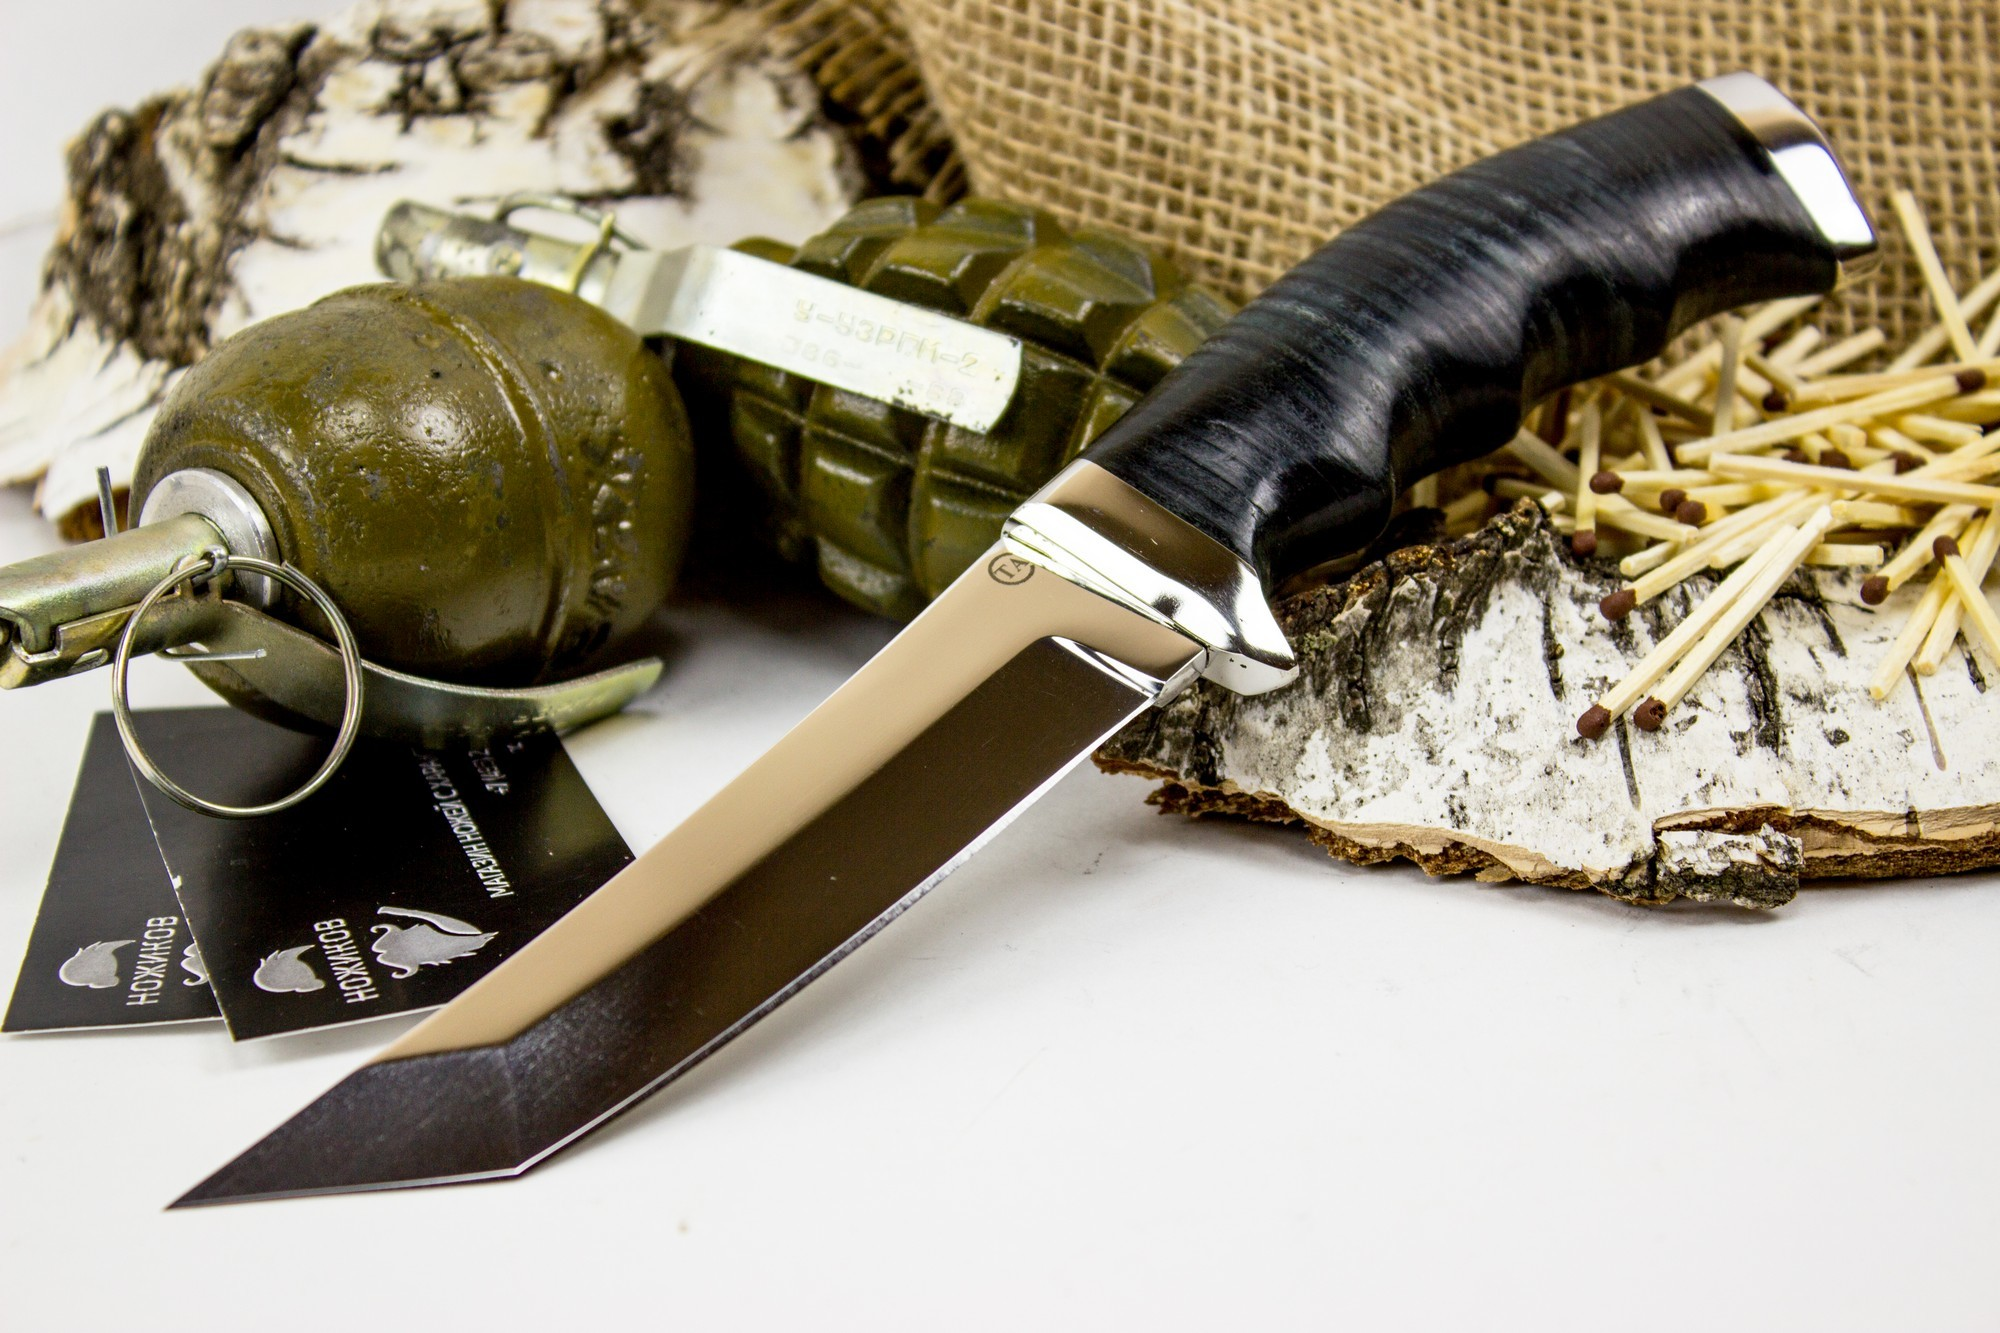 Фото 2 - Нож Аркан, сталь 95х18, кожа от Титов и Солдатова